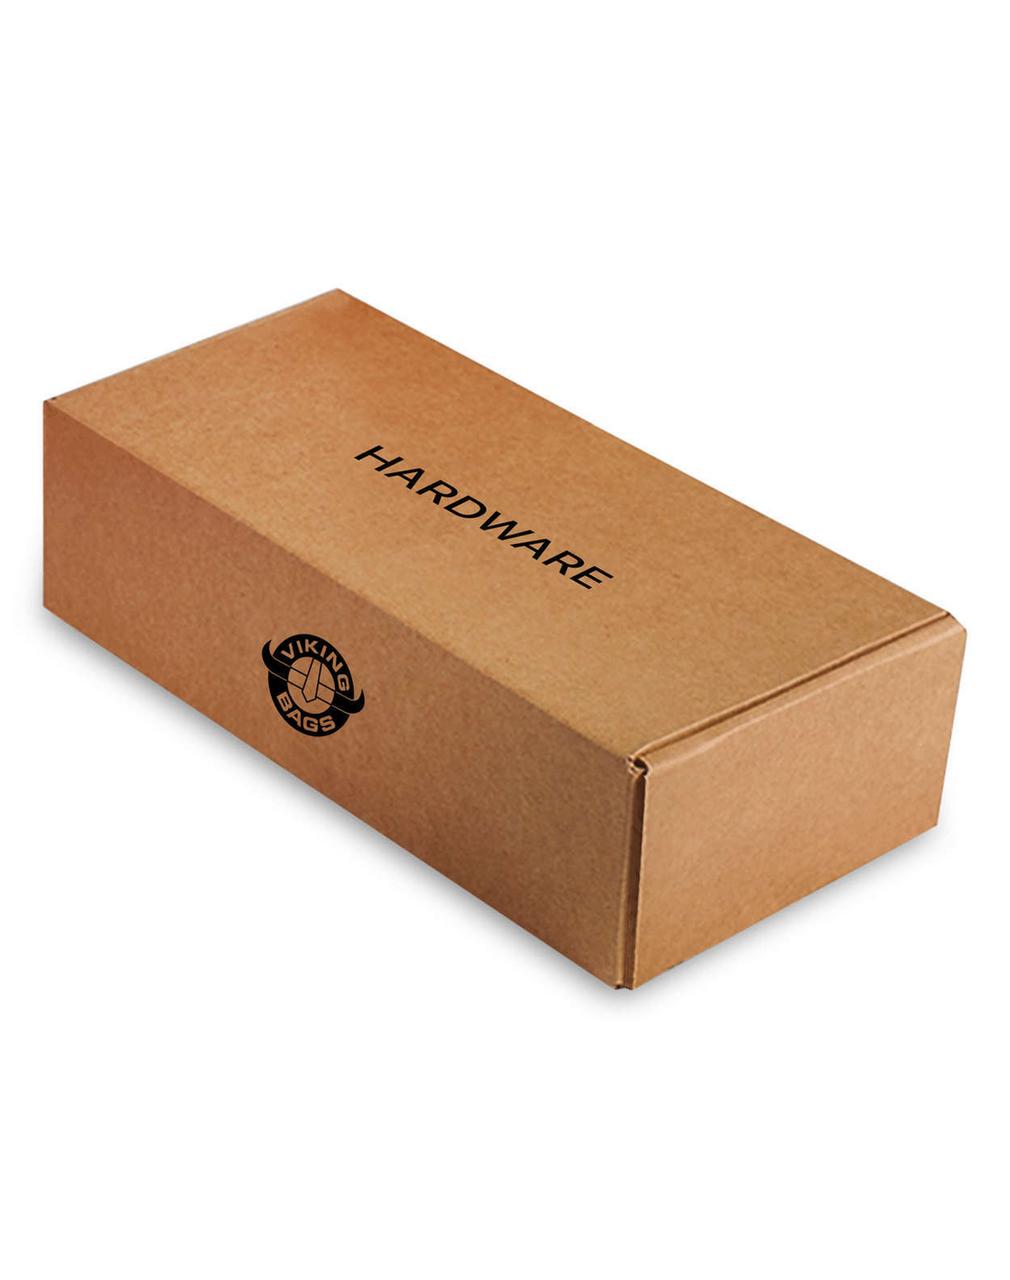 Triumph Rocket III Range Viking Raven Medium Leather Motorcycle Saddlebags Box